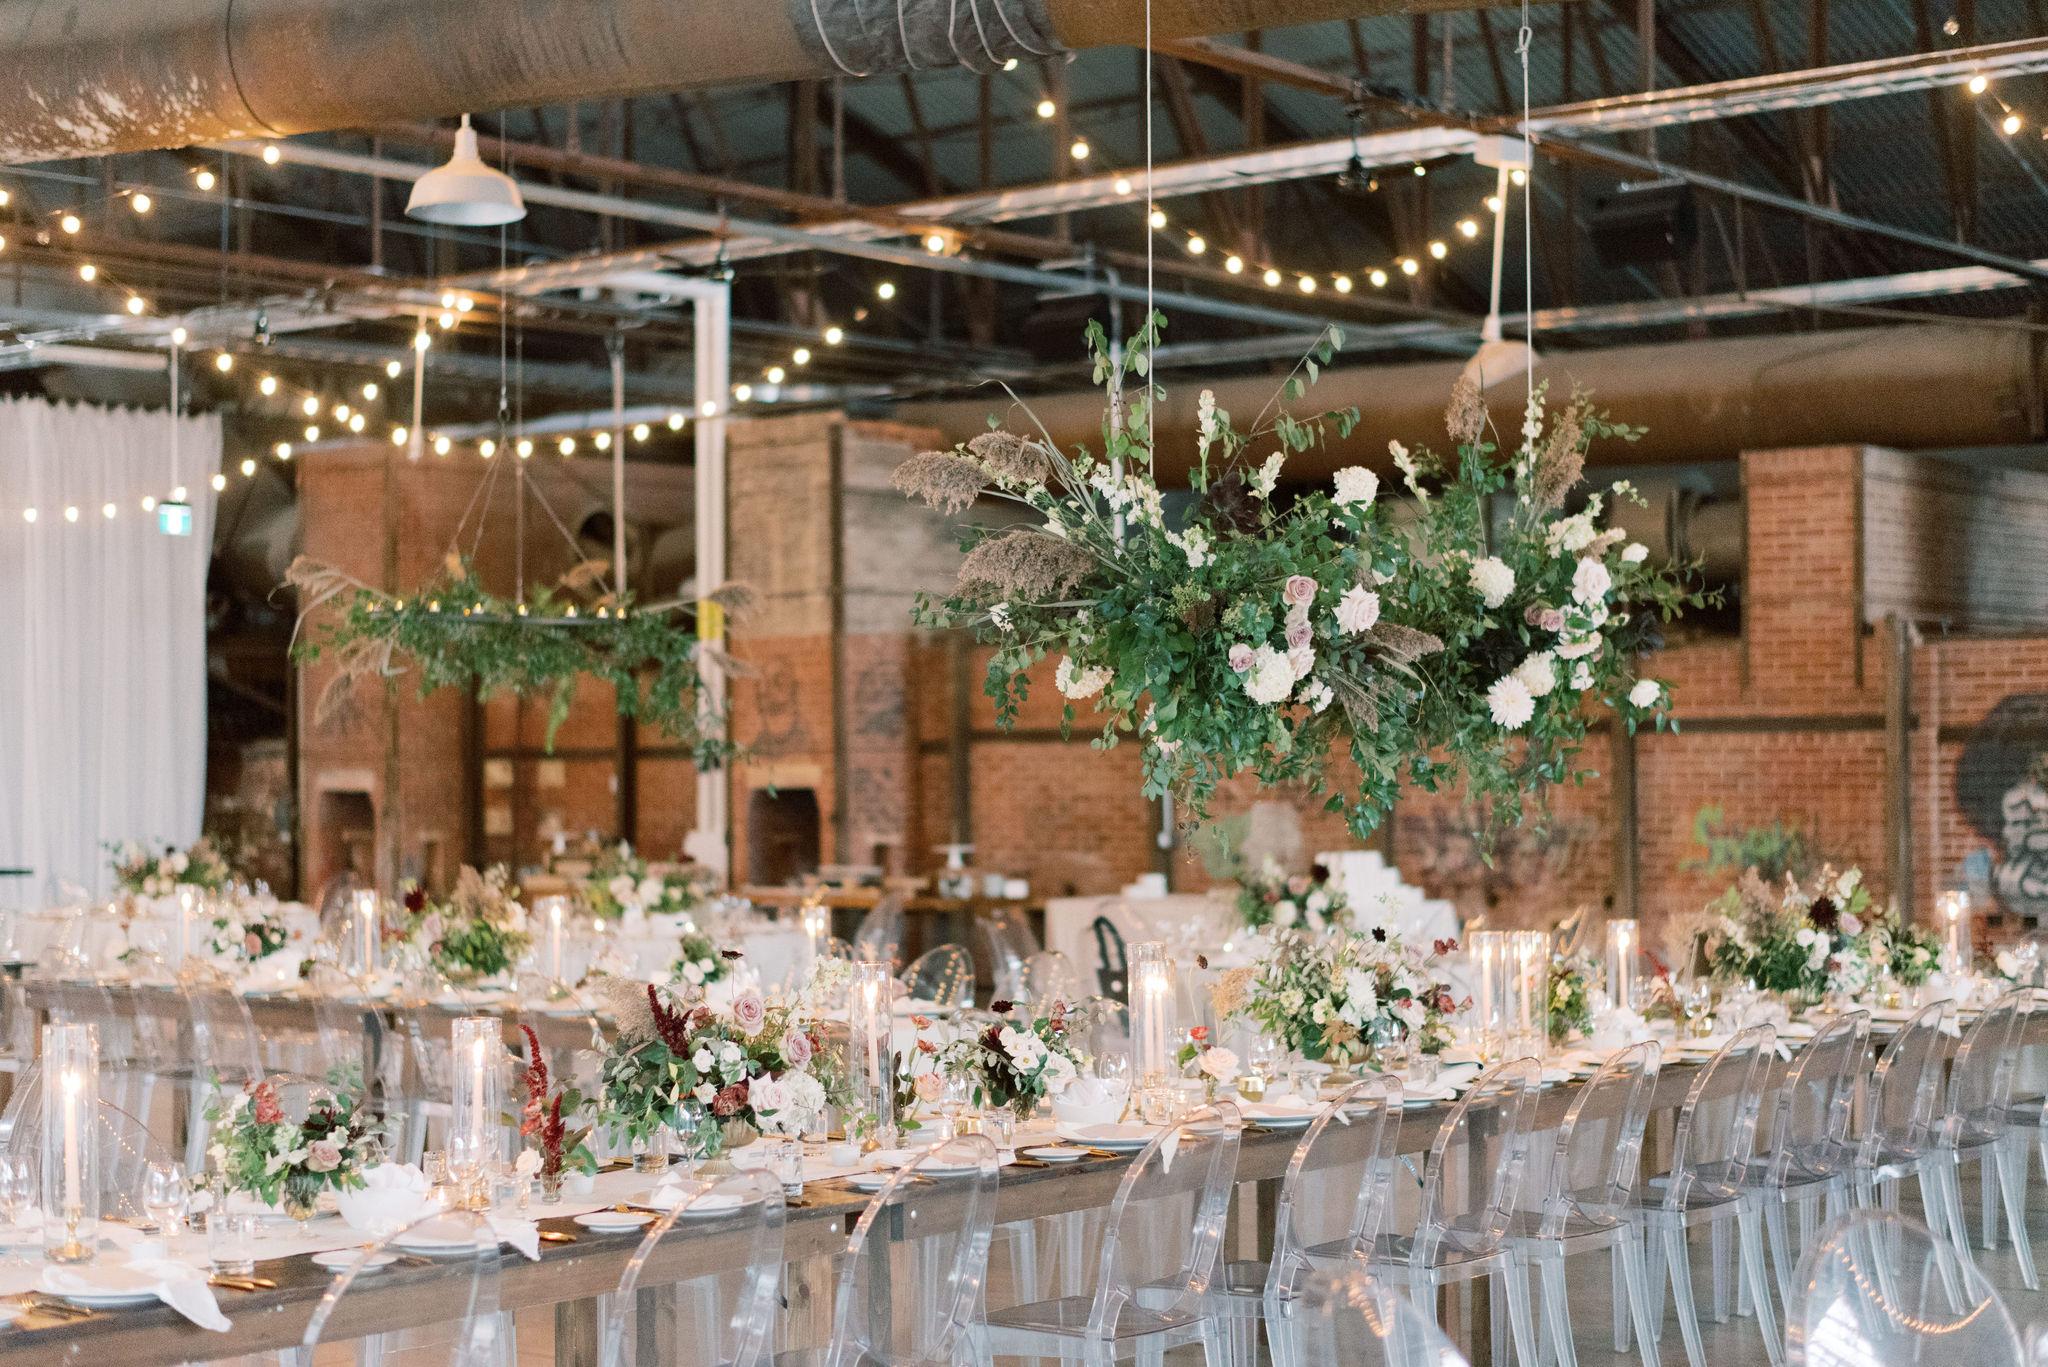 1375-artiese-evergreen-brickworks-wedding-ashleycraig-10538.jpg